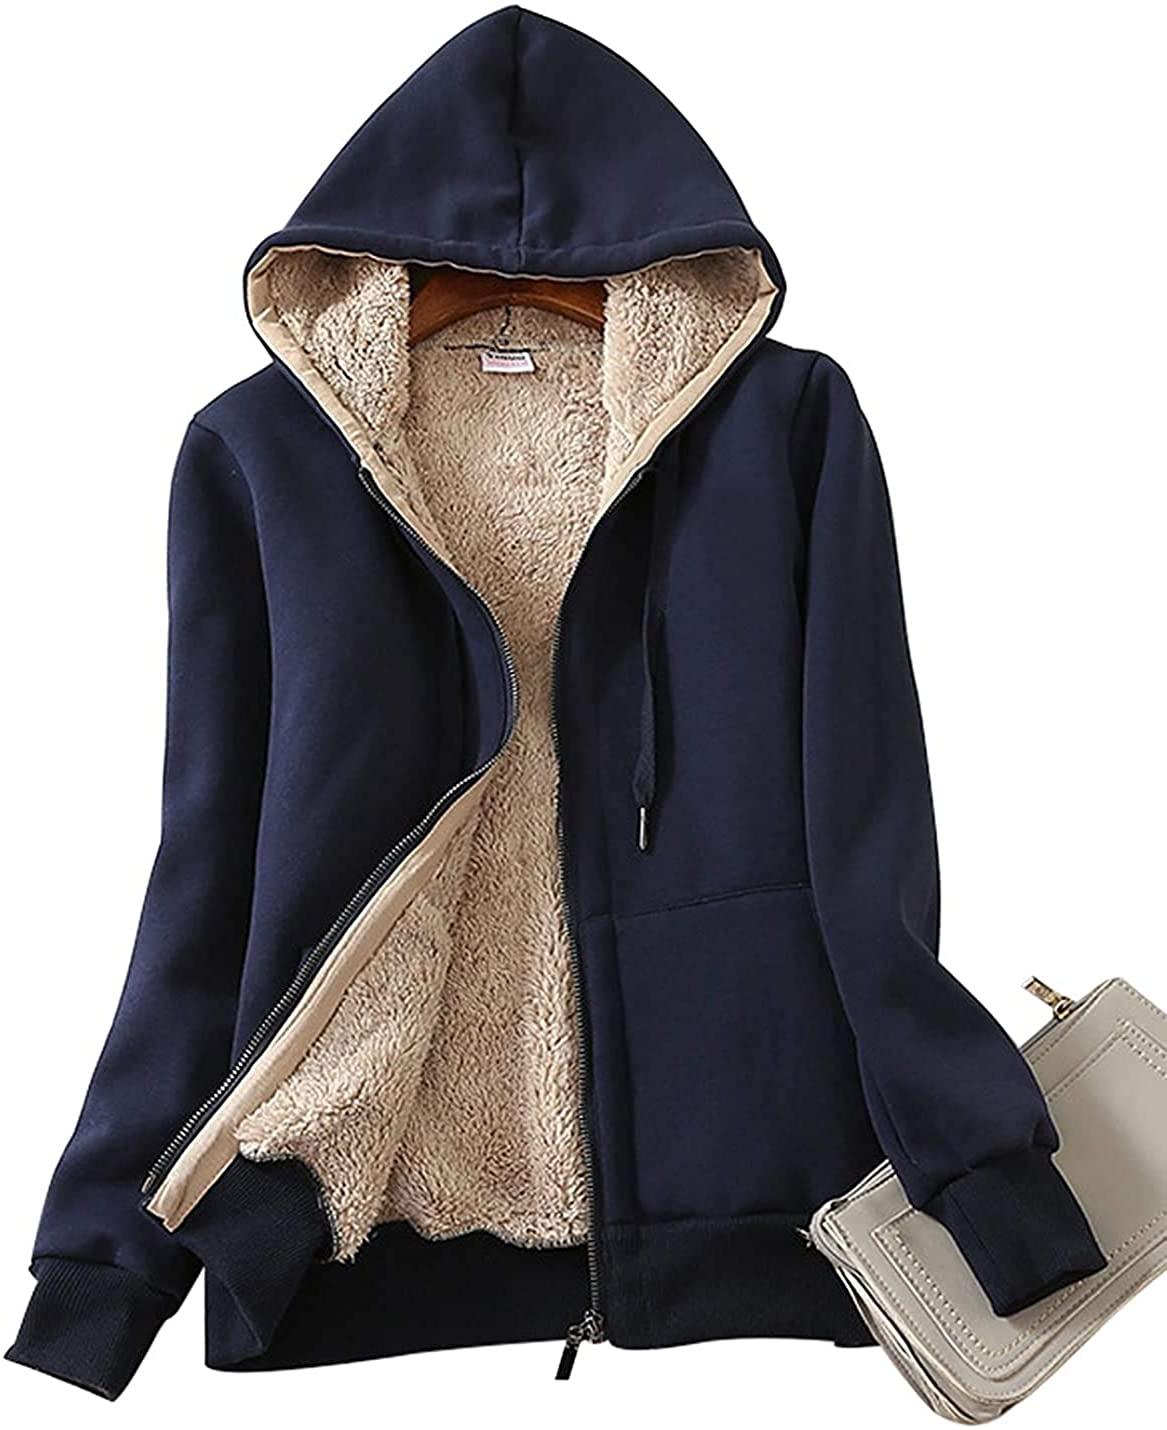 SWISSWELL Hoodies for Women Winter Fleece Sweatshirt - Full Zip Up Thick Sherpa Lined